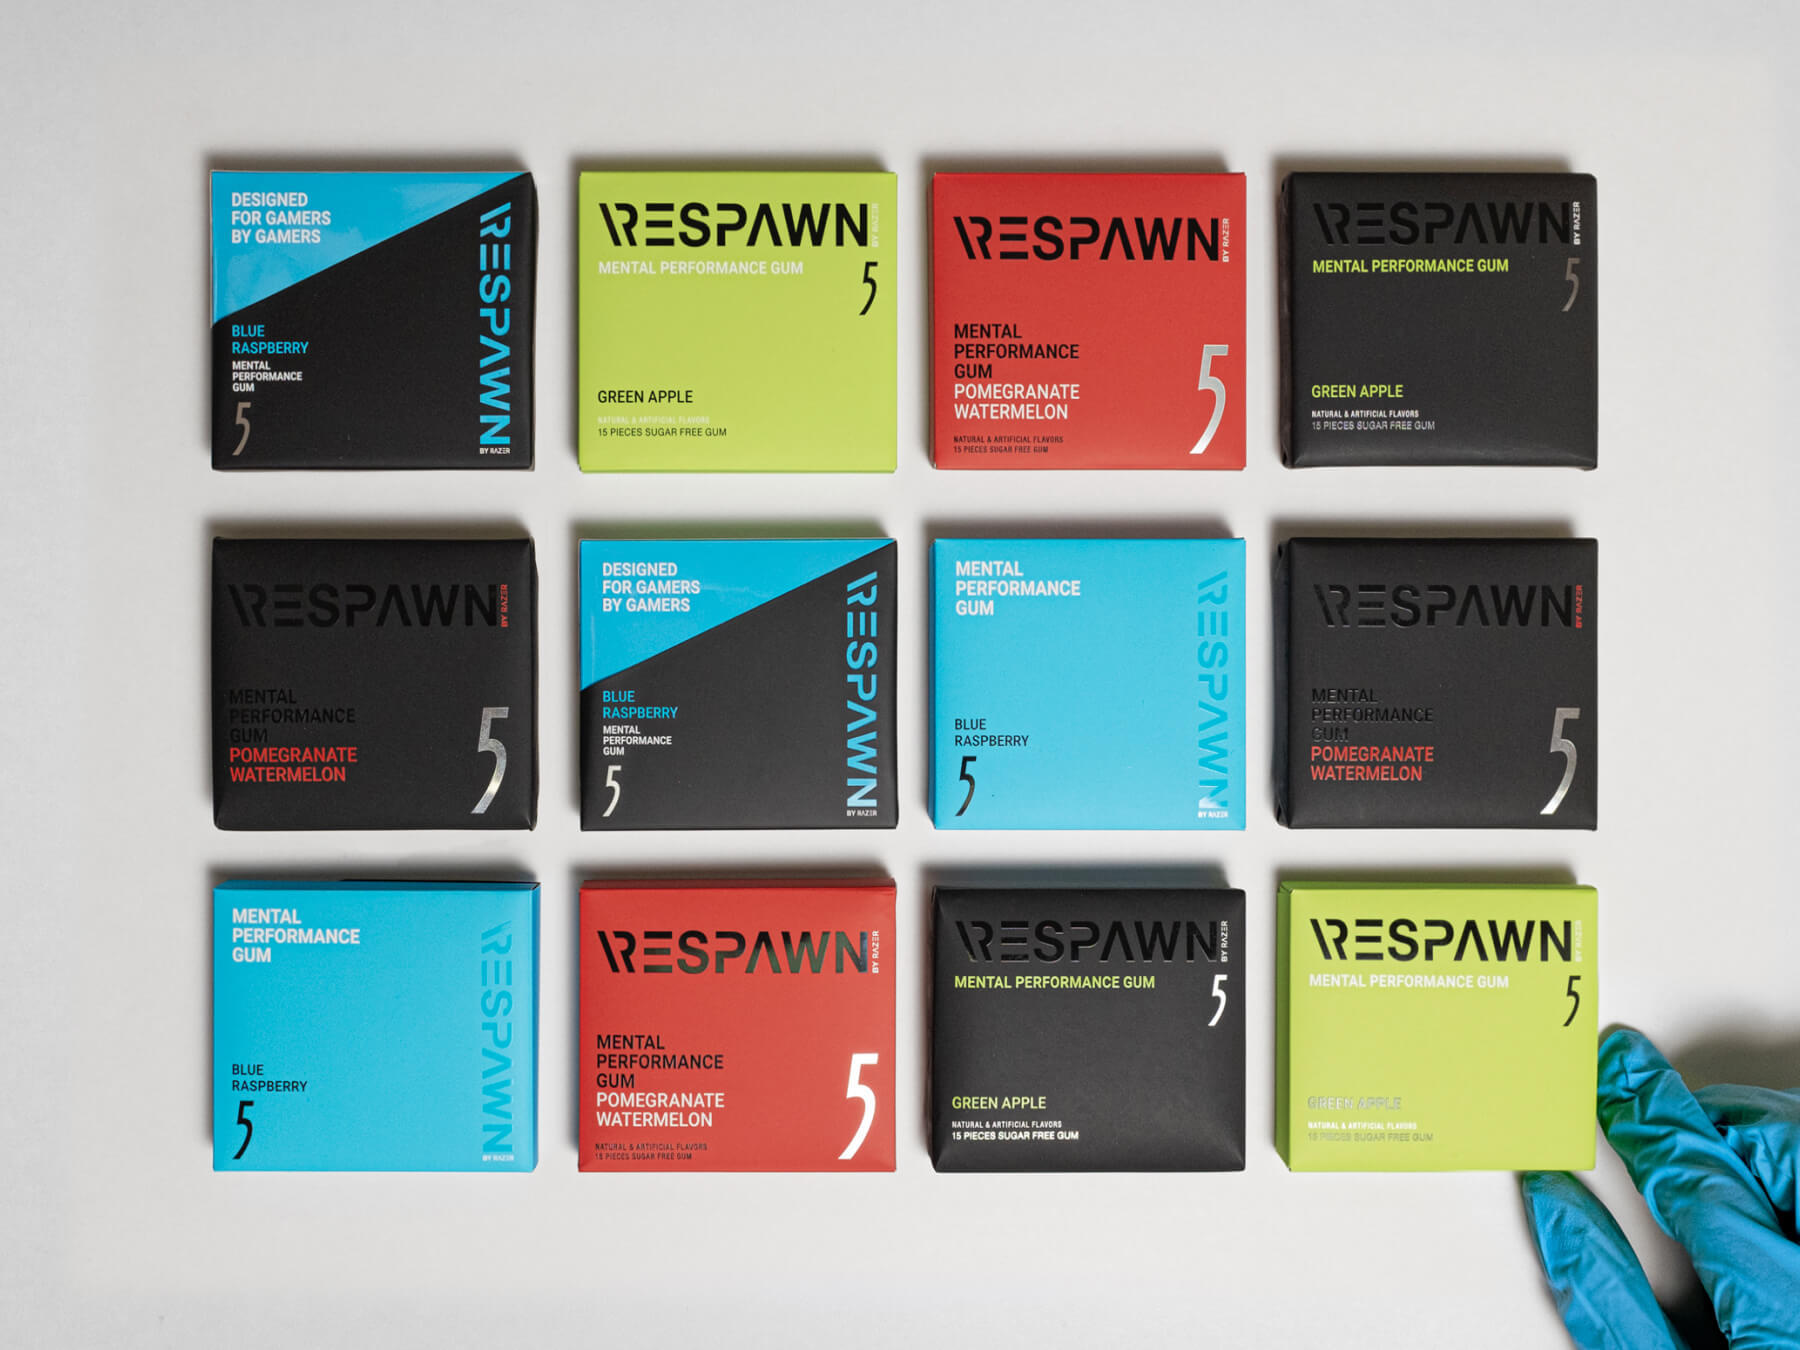 1800w-Respawn-01-2